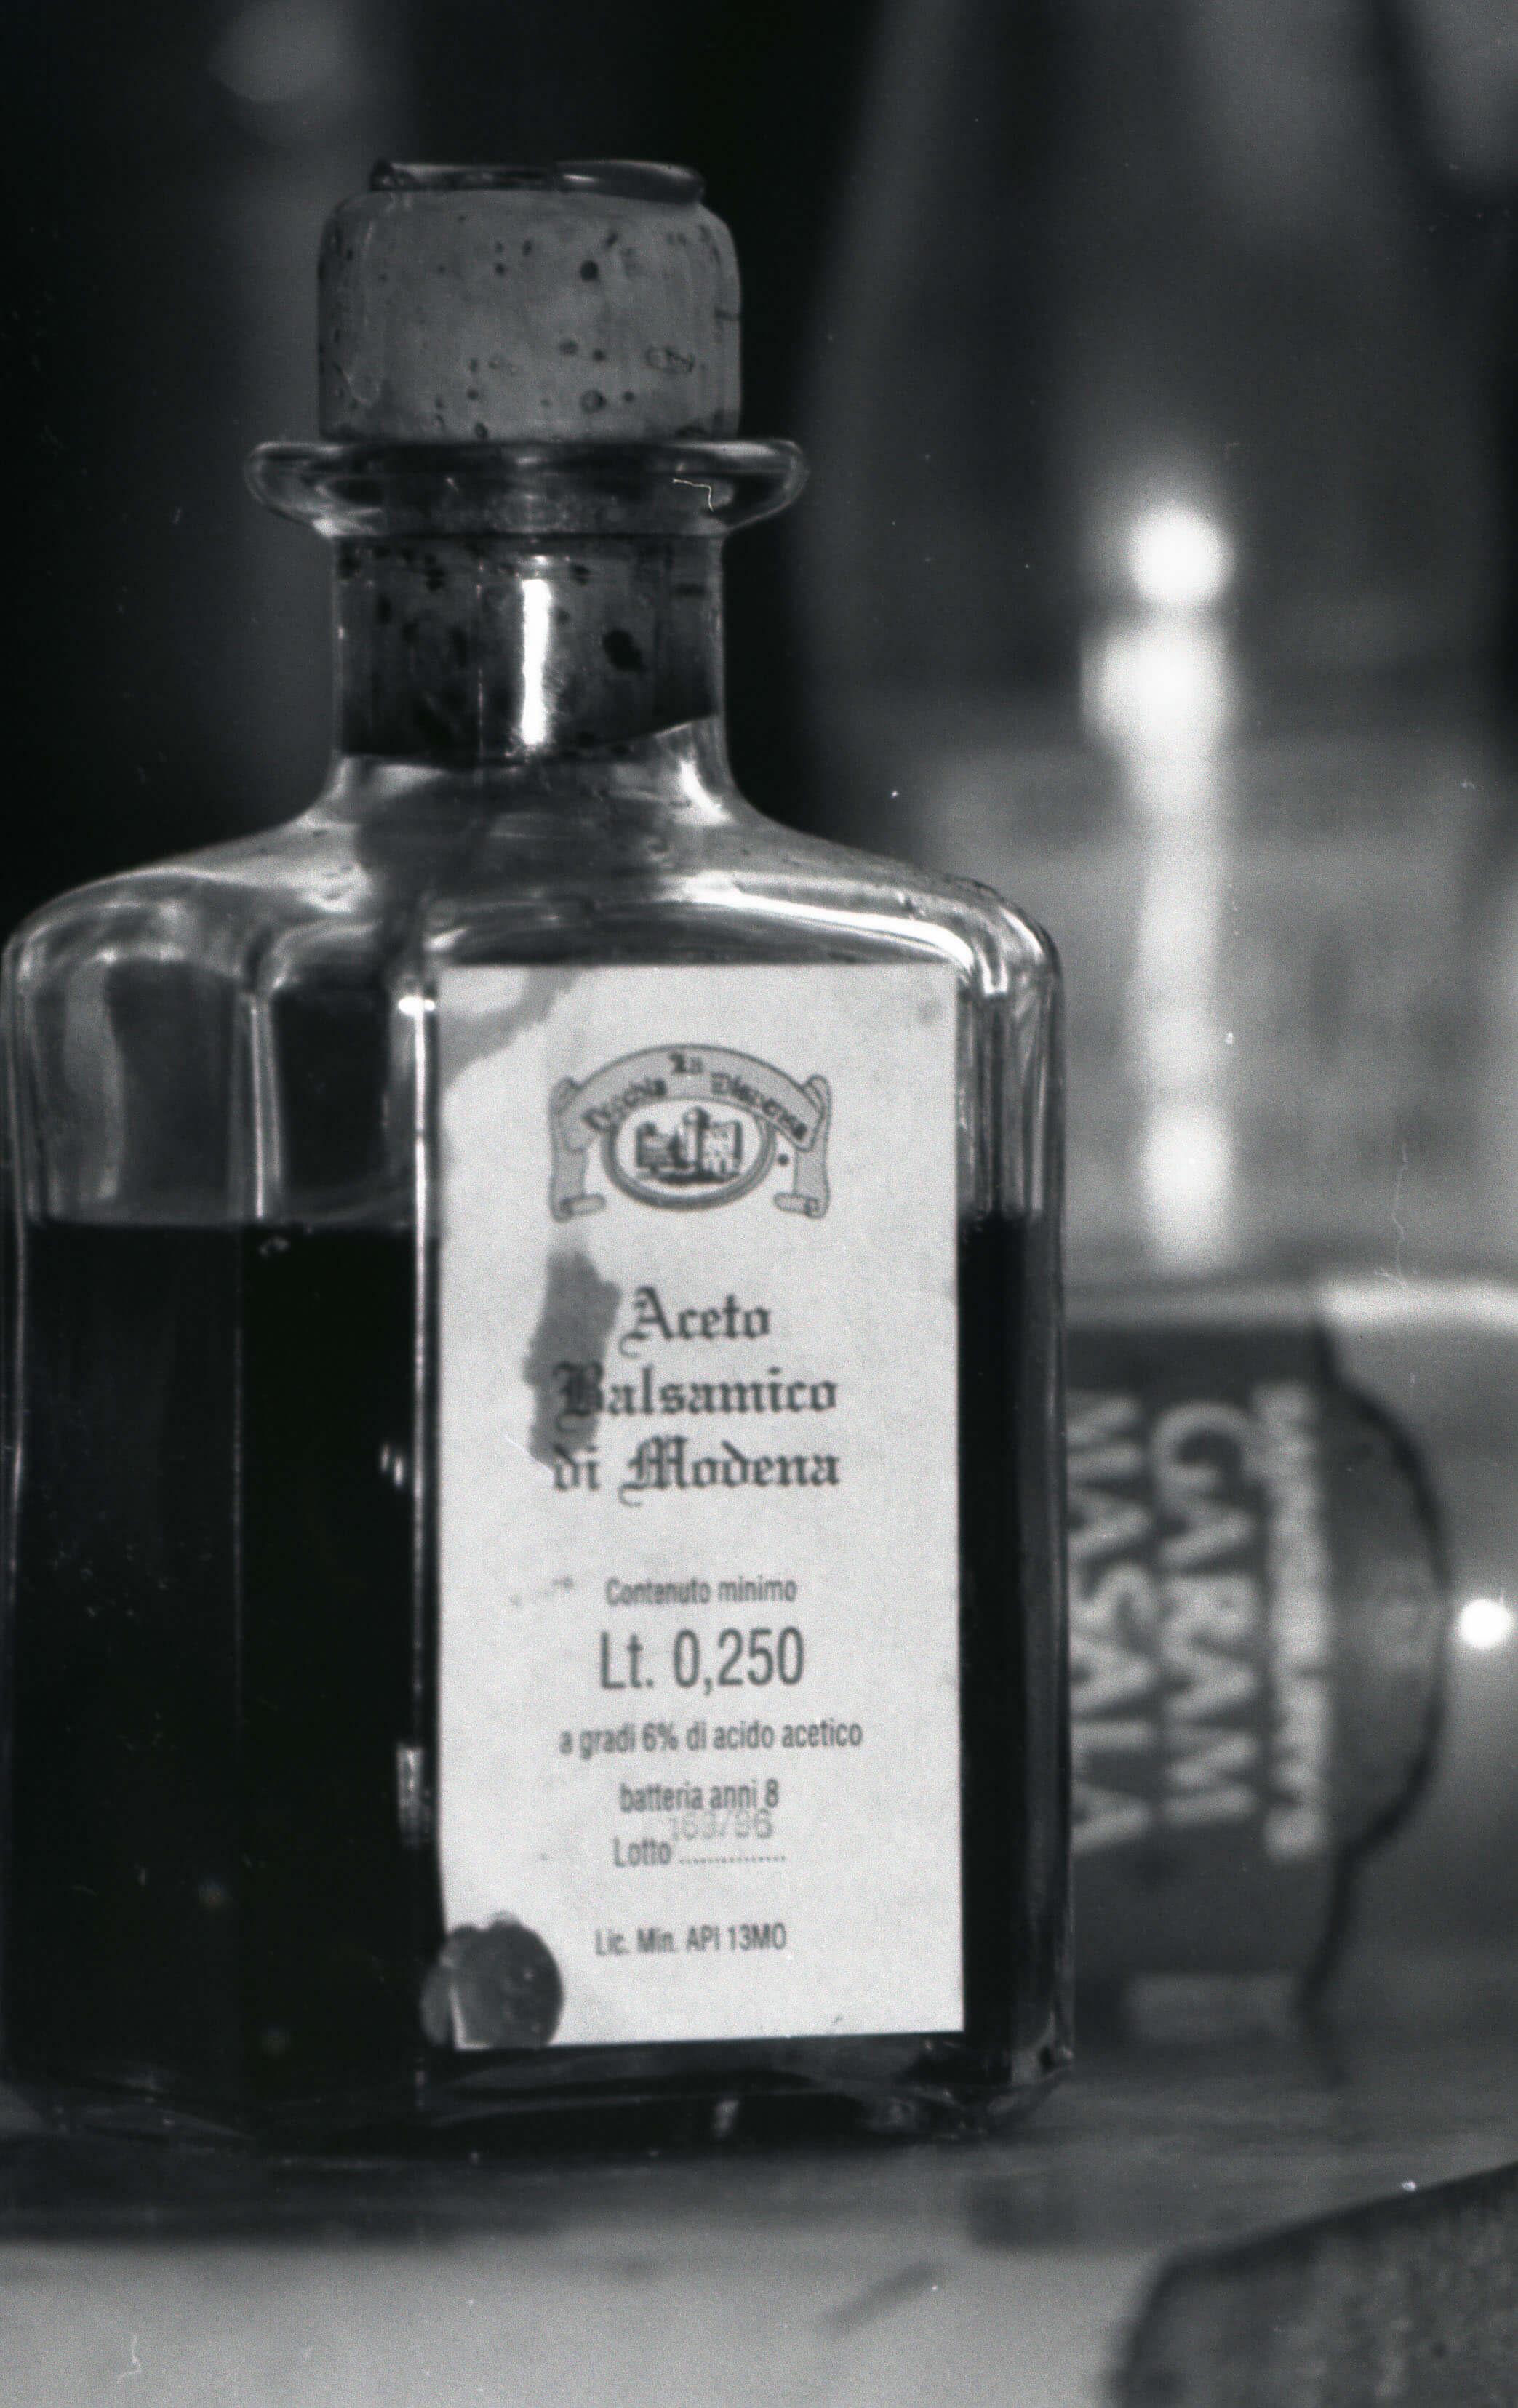 balsamic-vinegar_freeimages.com